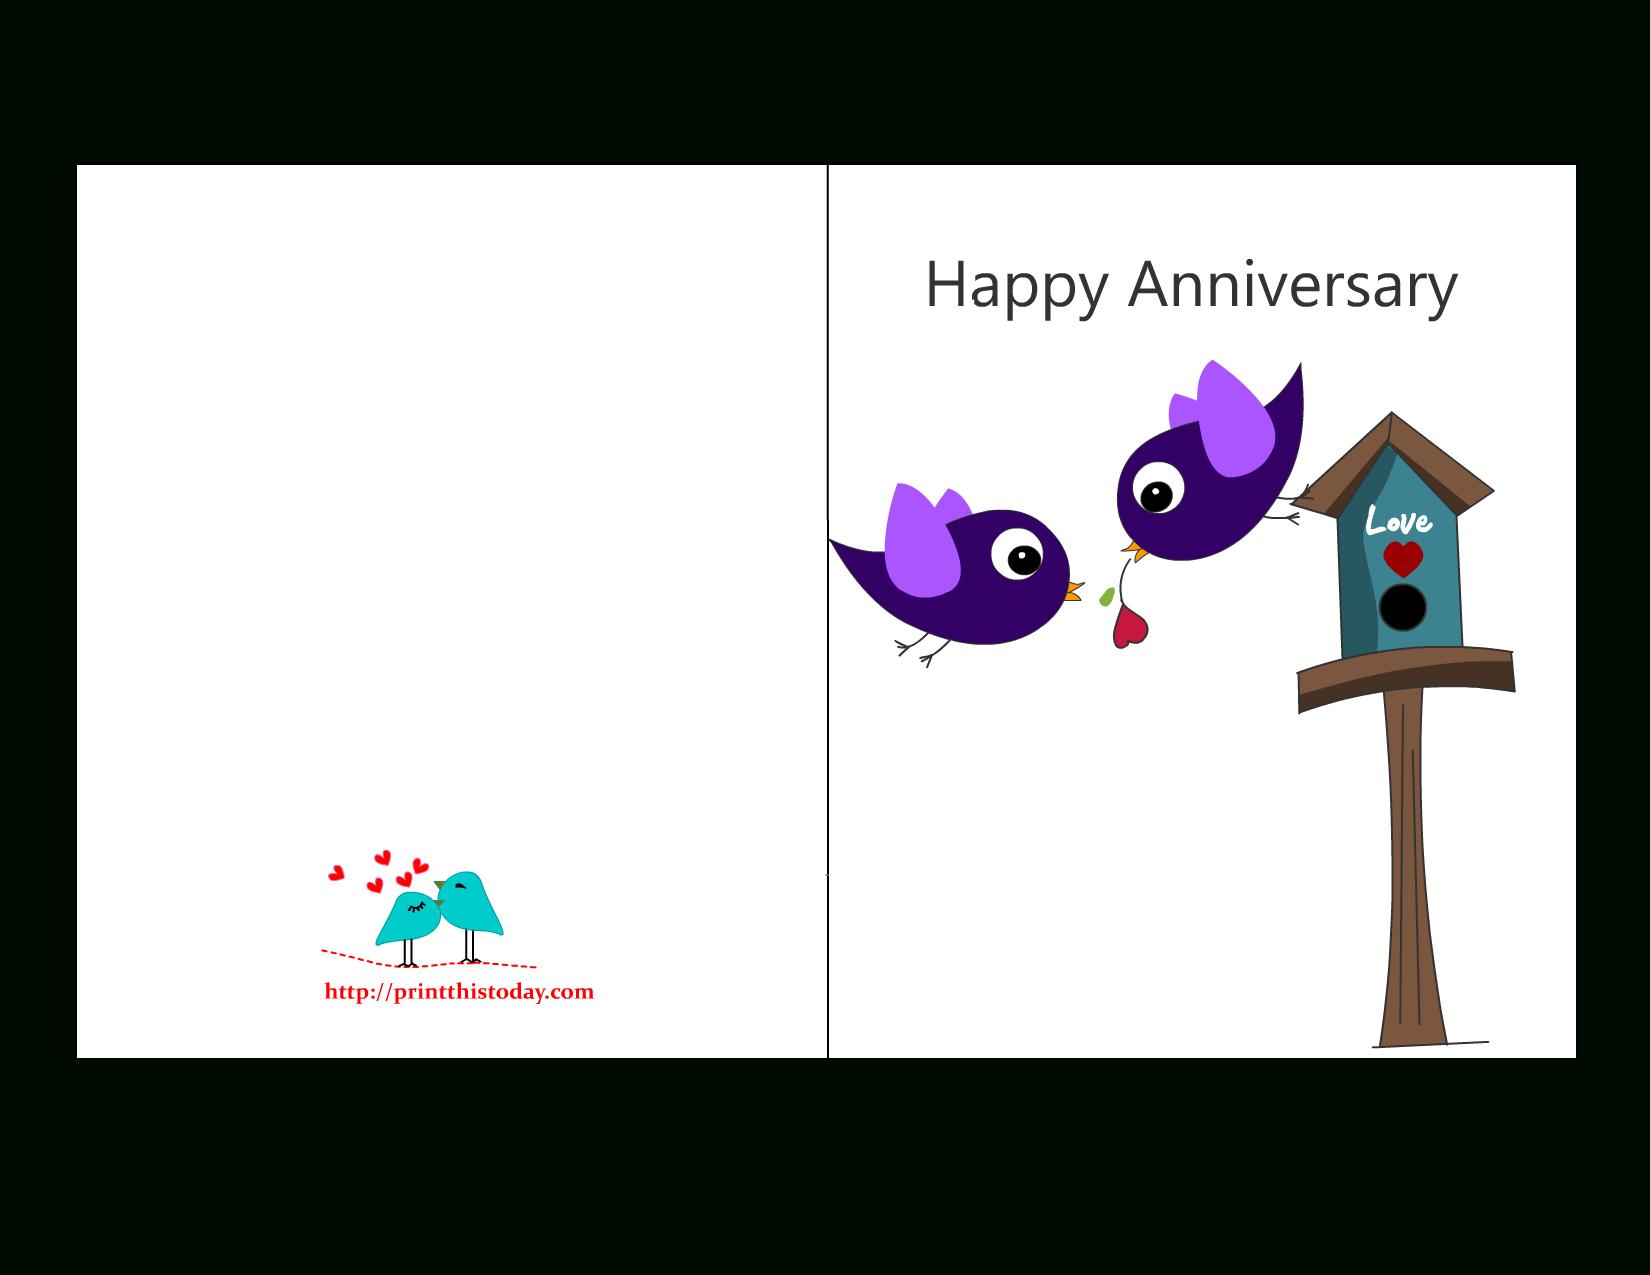 Free Anniversary Cards To Print | Free Printable Anniversary Cards - Free Printable Anniversary Cards